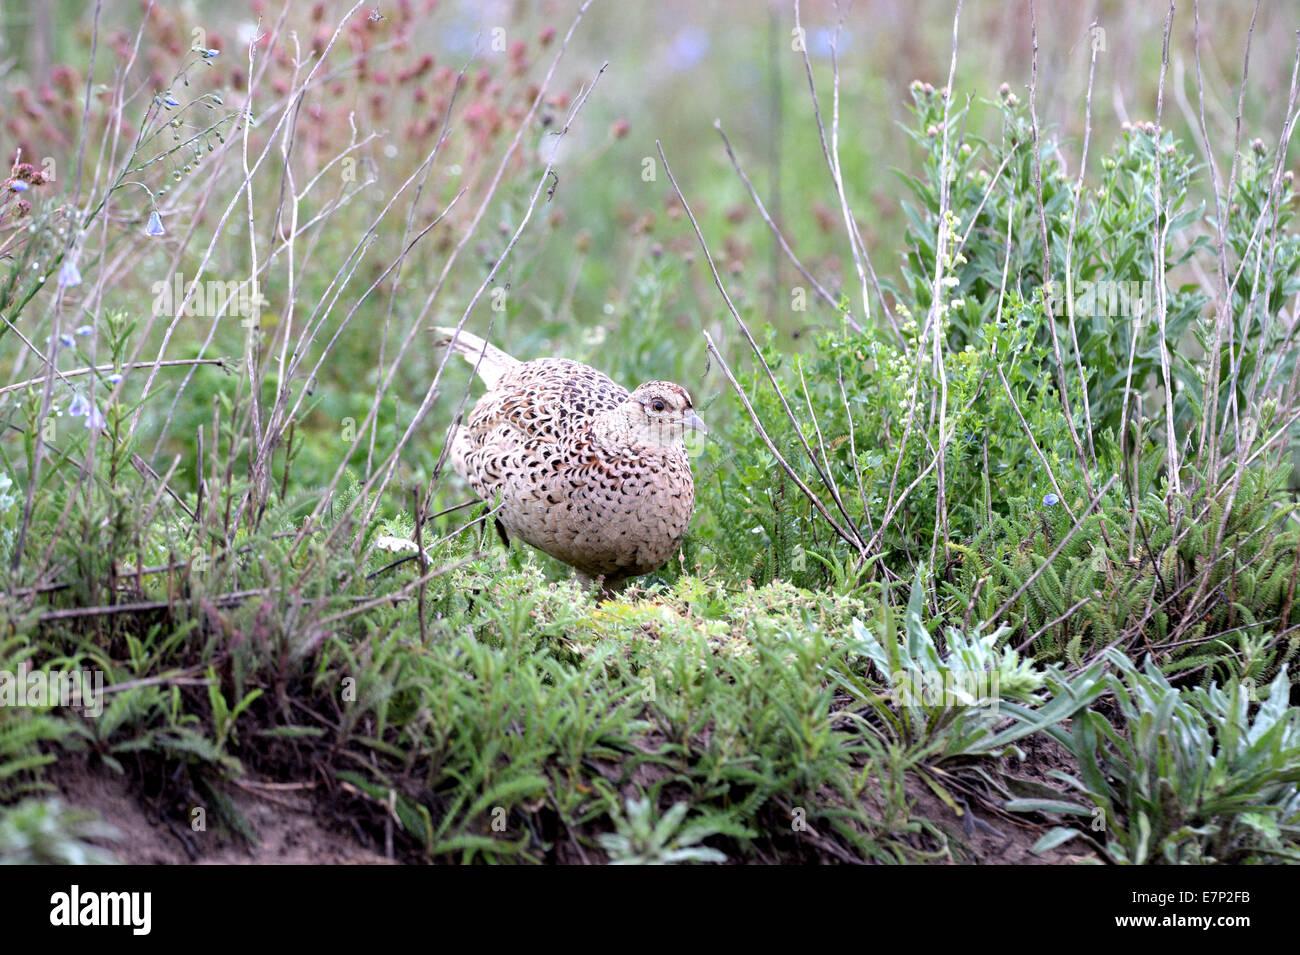 Pheasant, common pheasant, gallinaceous birds, Phasianus colchicus mongolicus, partridges, bird, galliforms, pheasants, - Stock Image